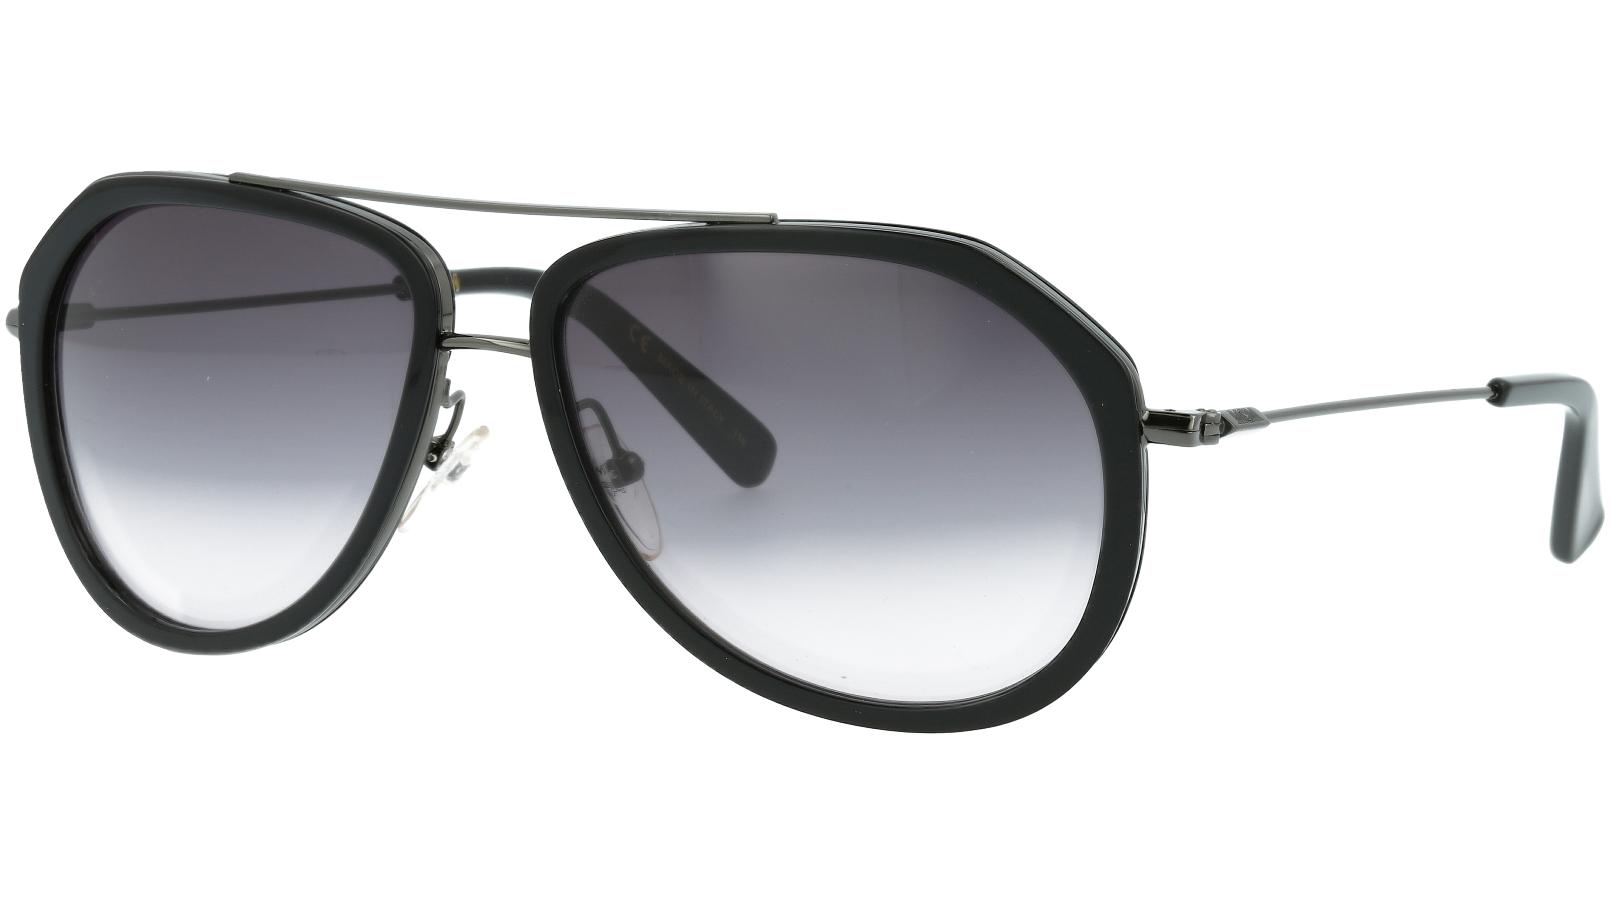 MCM MCM613S 001 58 BLACK Sunglasses